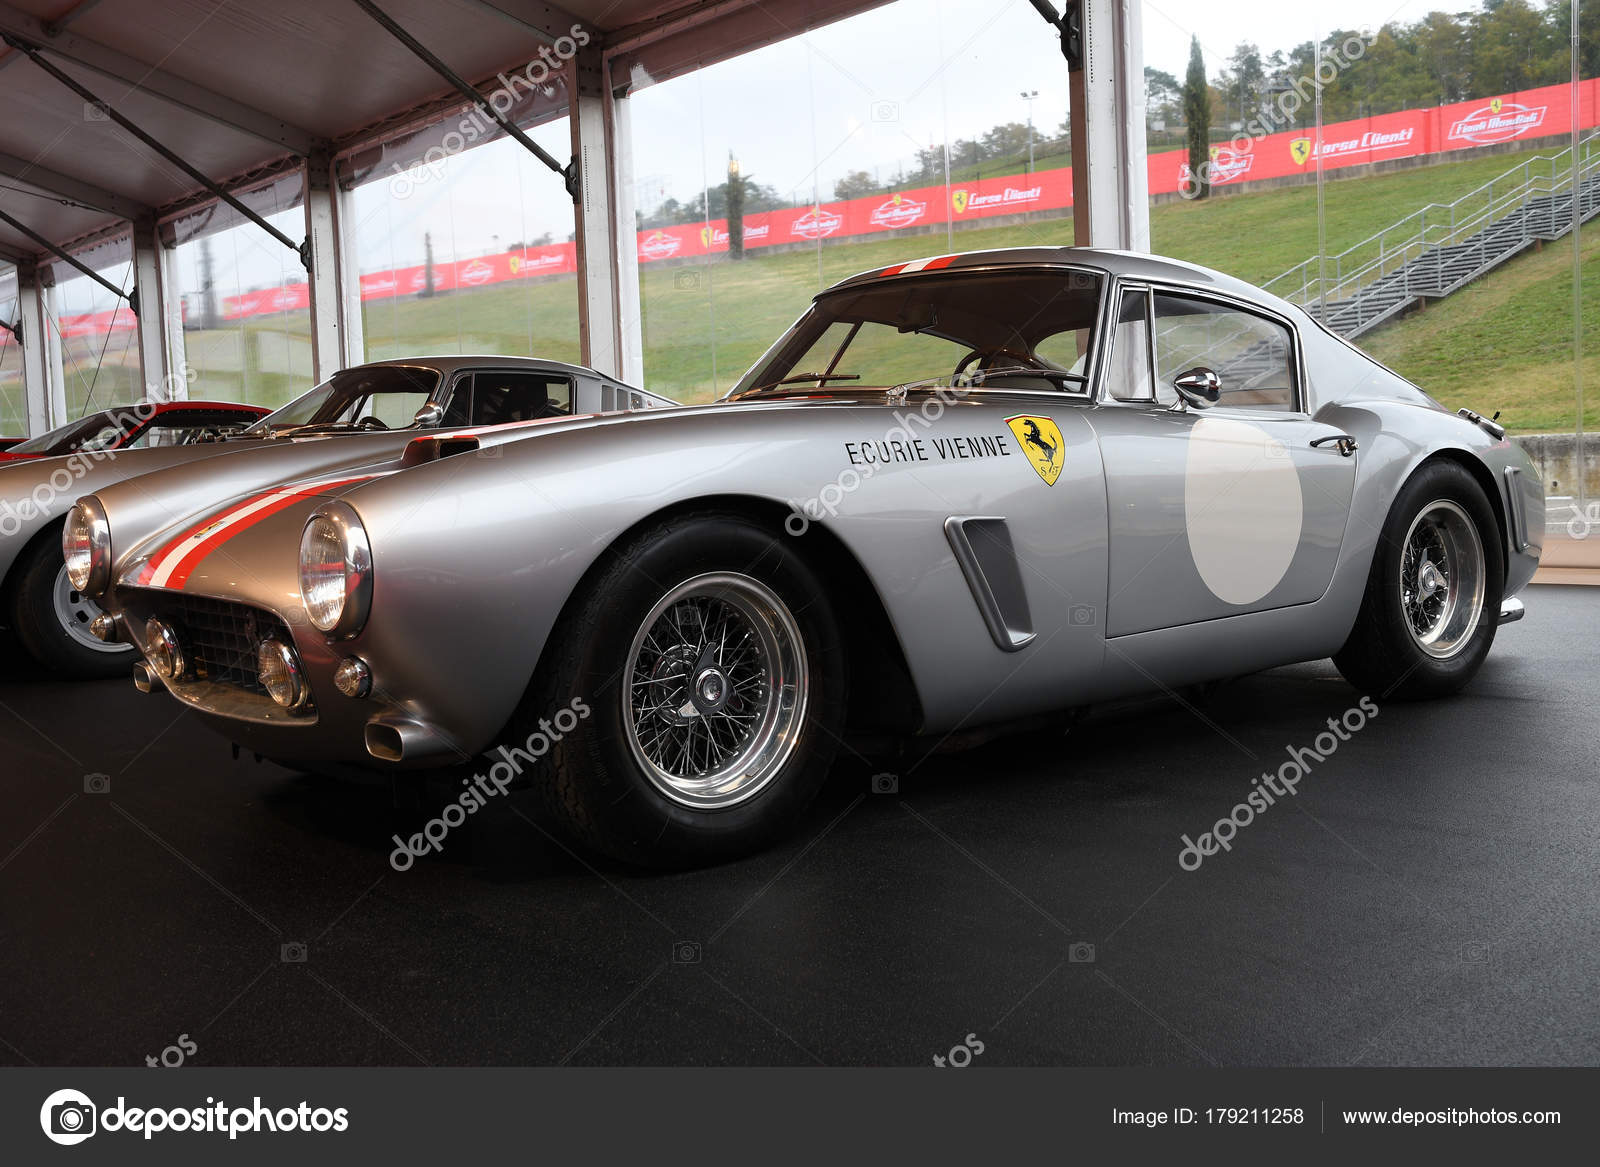 Mugello October 2017 Vintage Ferrari 250 Berlinetta Passo Corto 1961 Stock Editorial Photo C Dan74 179211258